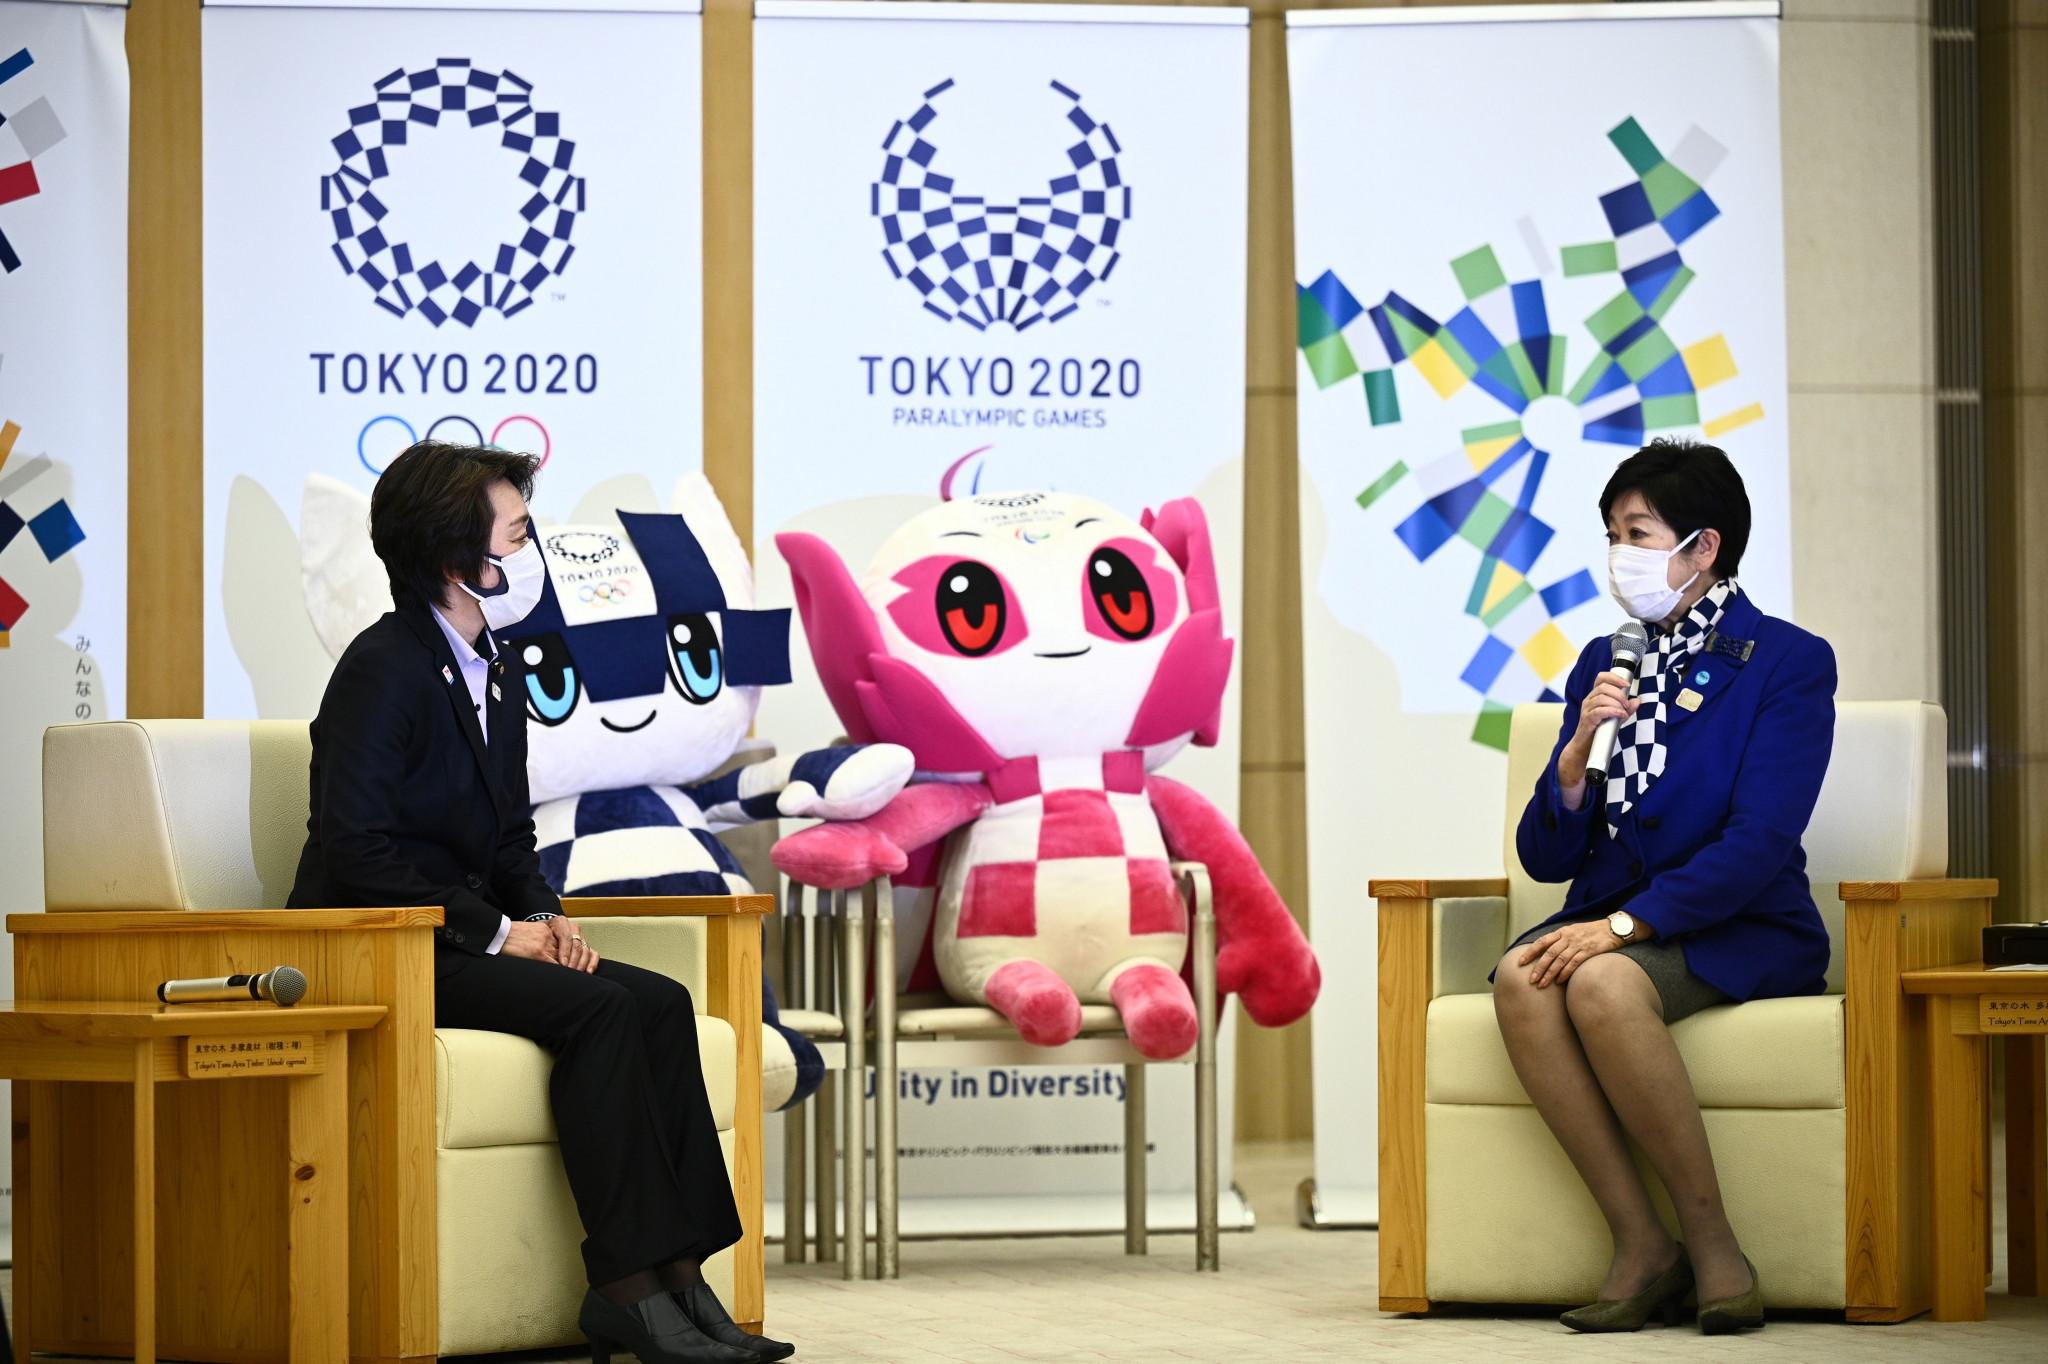 New Tokyo 2020 President Seiko Hashimoto, left, has already met with Tokyo Governor Yuriko Koike ©Getty Images